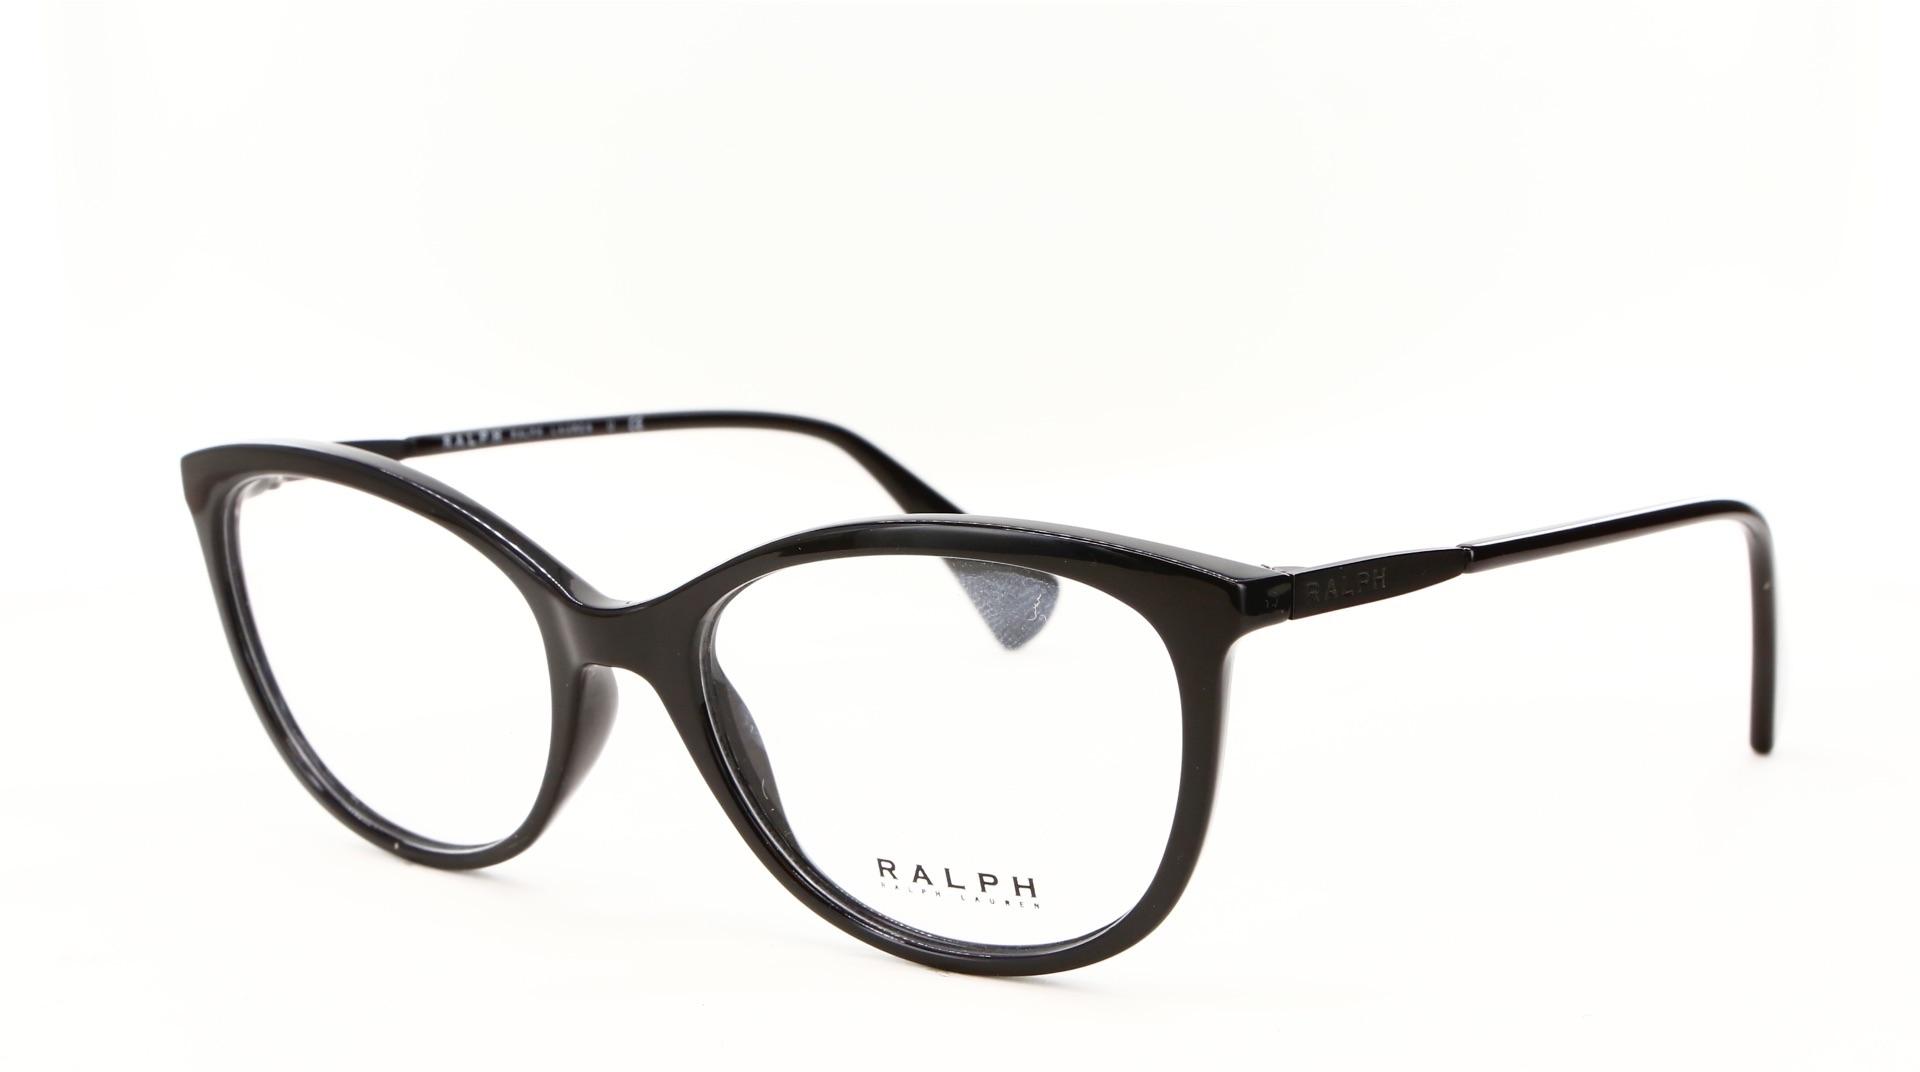 78641 | Polo Ralph Lauren Frames | Claeyssens Optic | Brugge & Gent